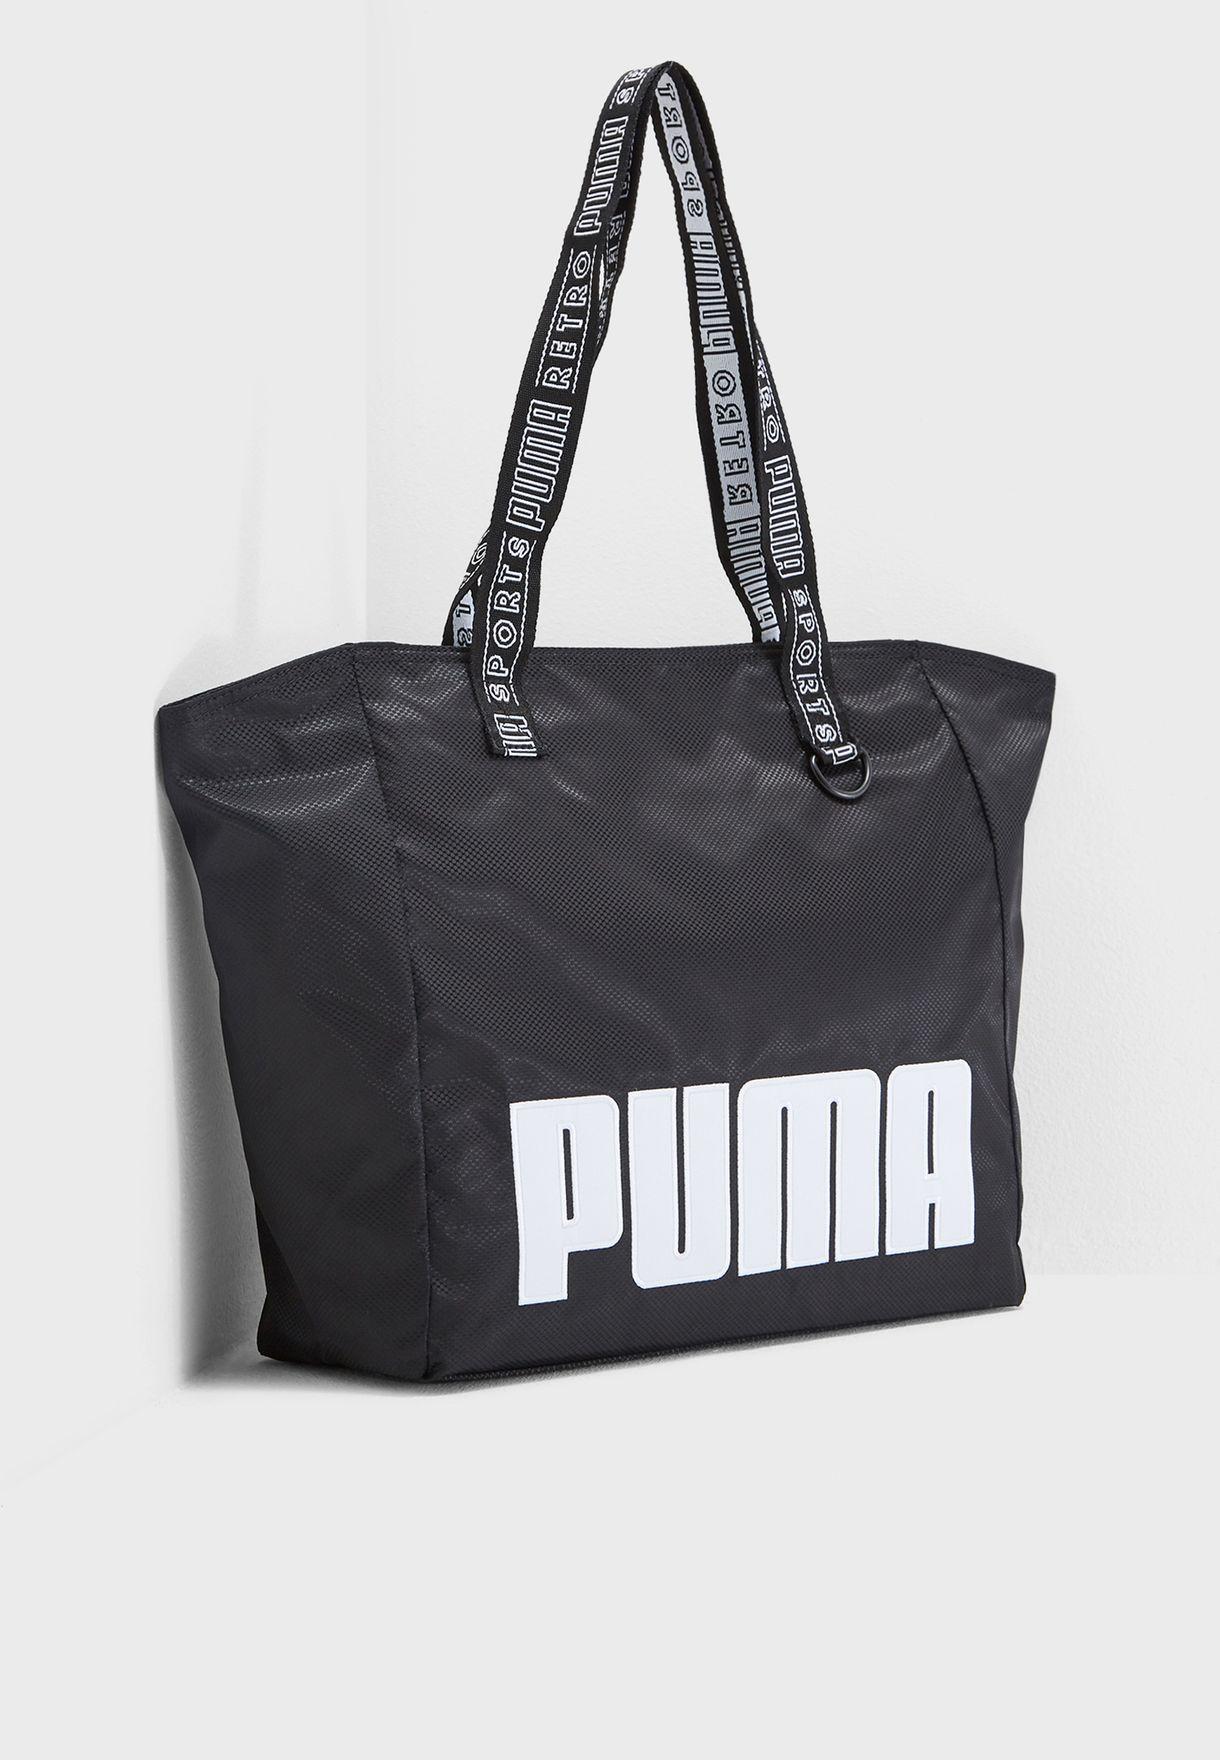 5efb6af96f2d Shop PUMA black Large Prime Street Shopper 7540901 for Women in Bahrain -  PU020AC52EWX